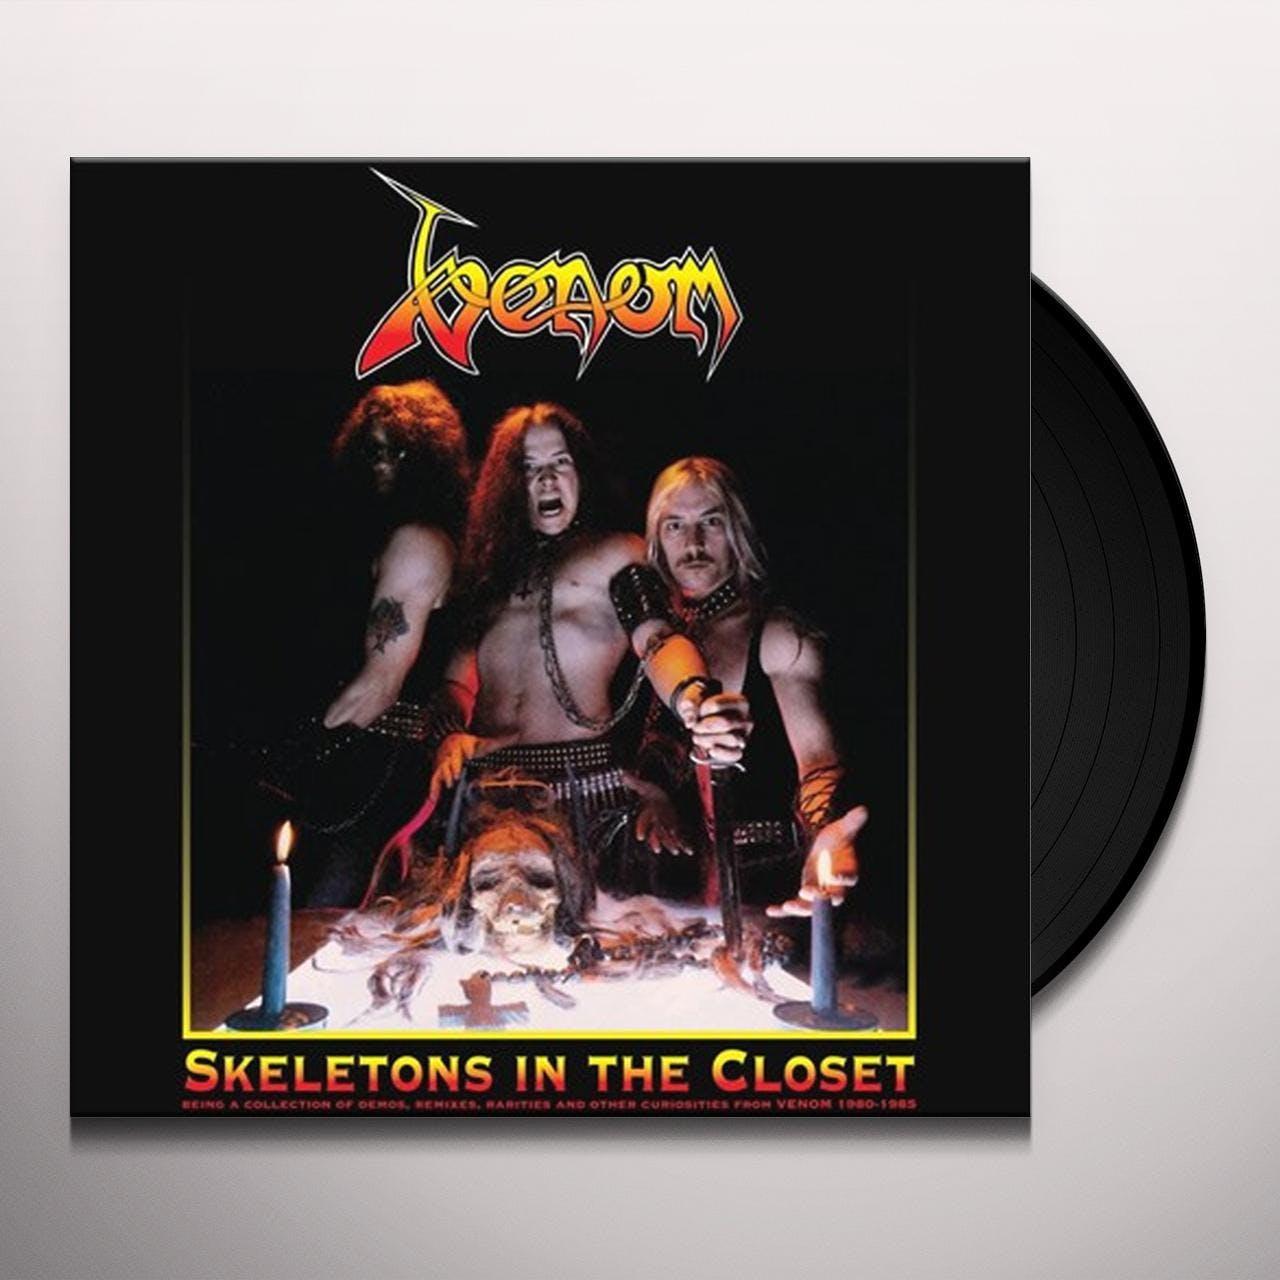 Venom Skeletons In The Closet Vinyl Record